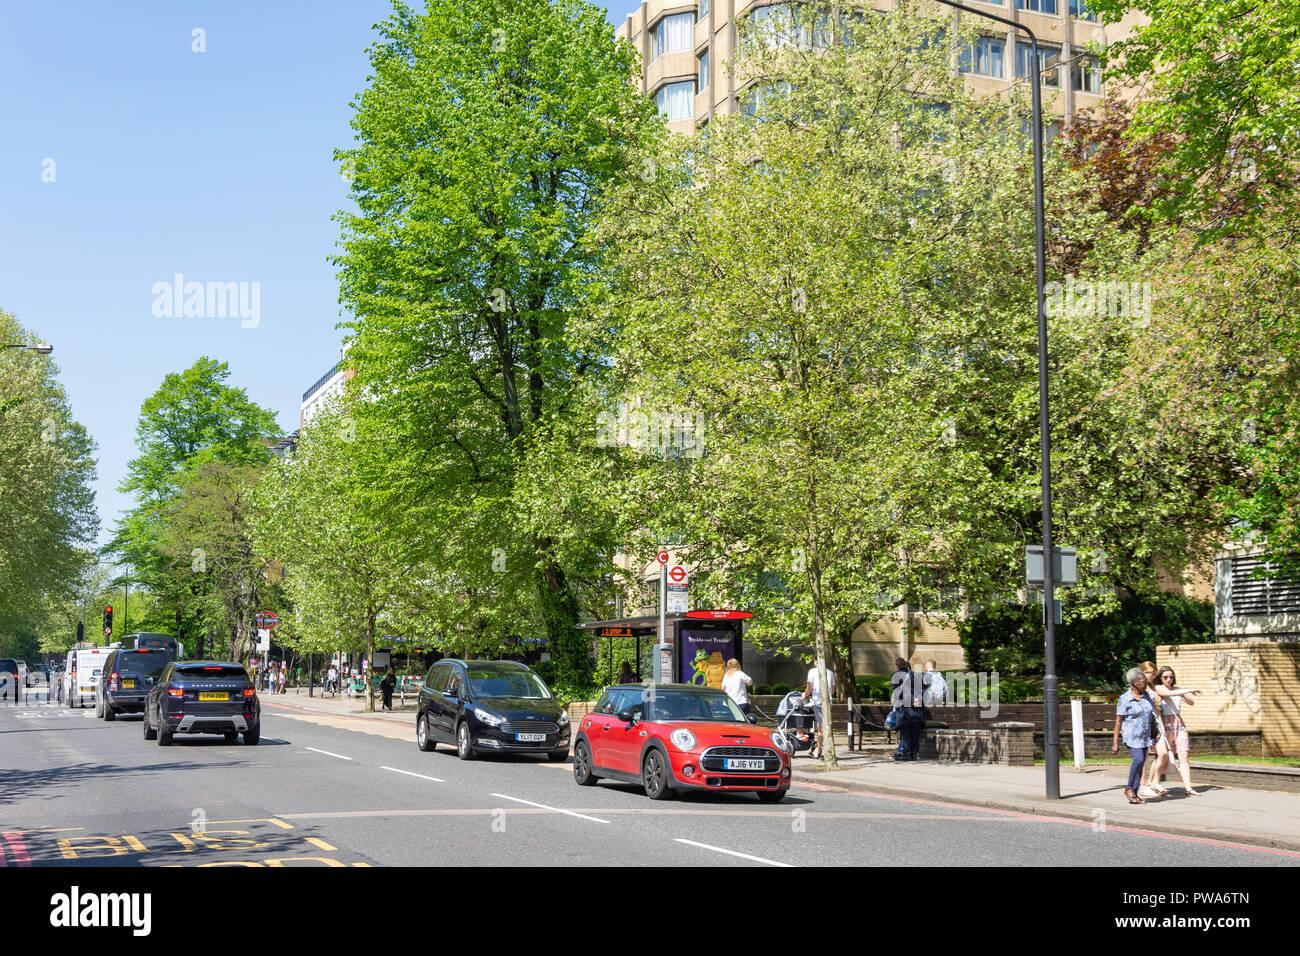 Wellington Road, St John's Wood, City of Westminster, Greater London, England, United Kingdom - Stock Image